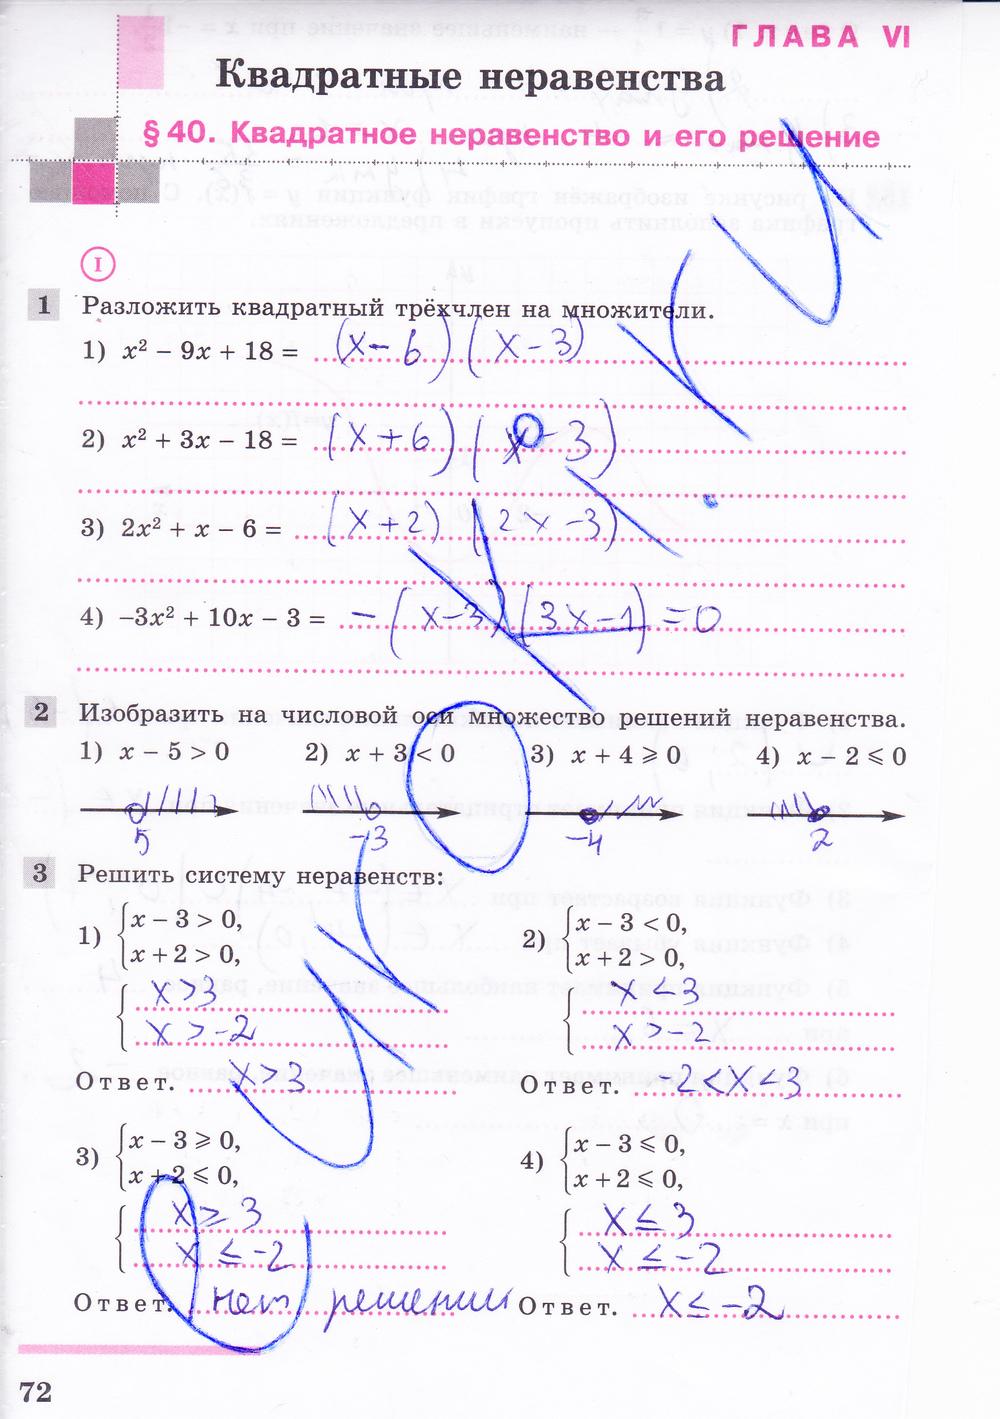 Гдз По Алгебре 7 Класс Колягин Ткачева Федорова Шабунин С Проверь Себя